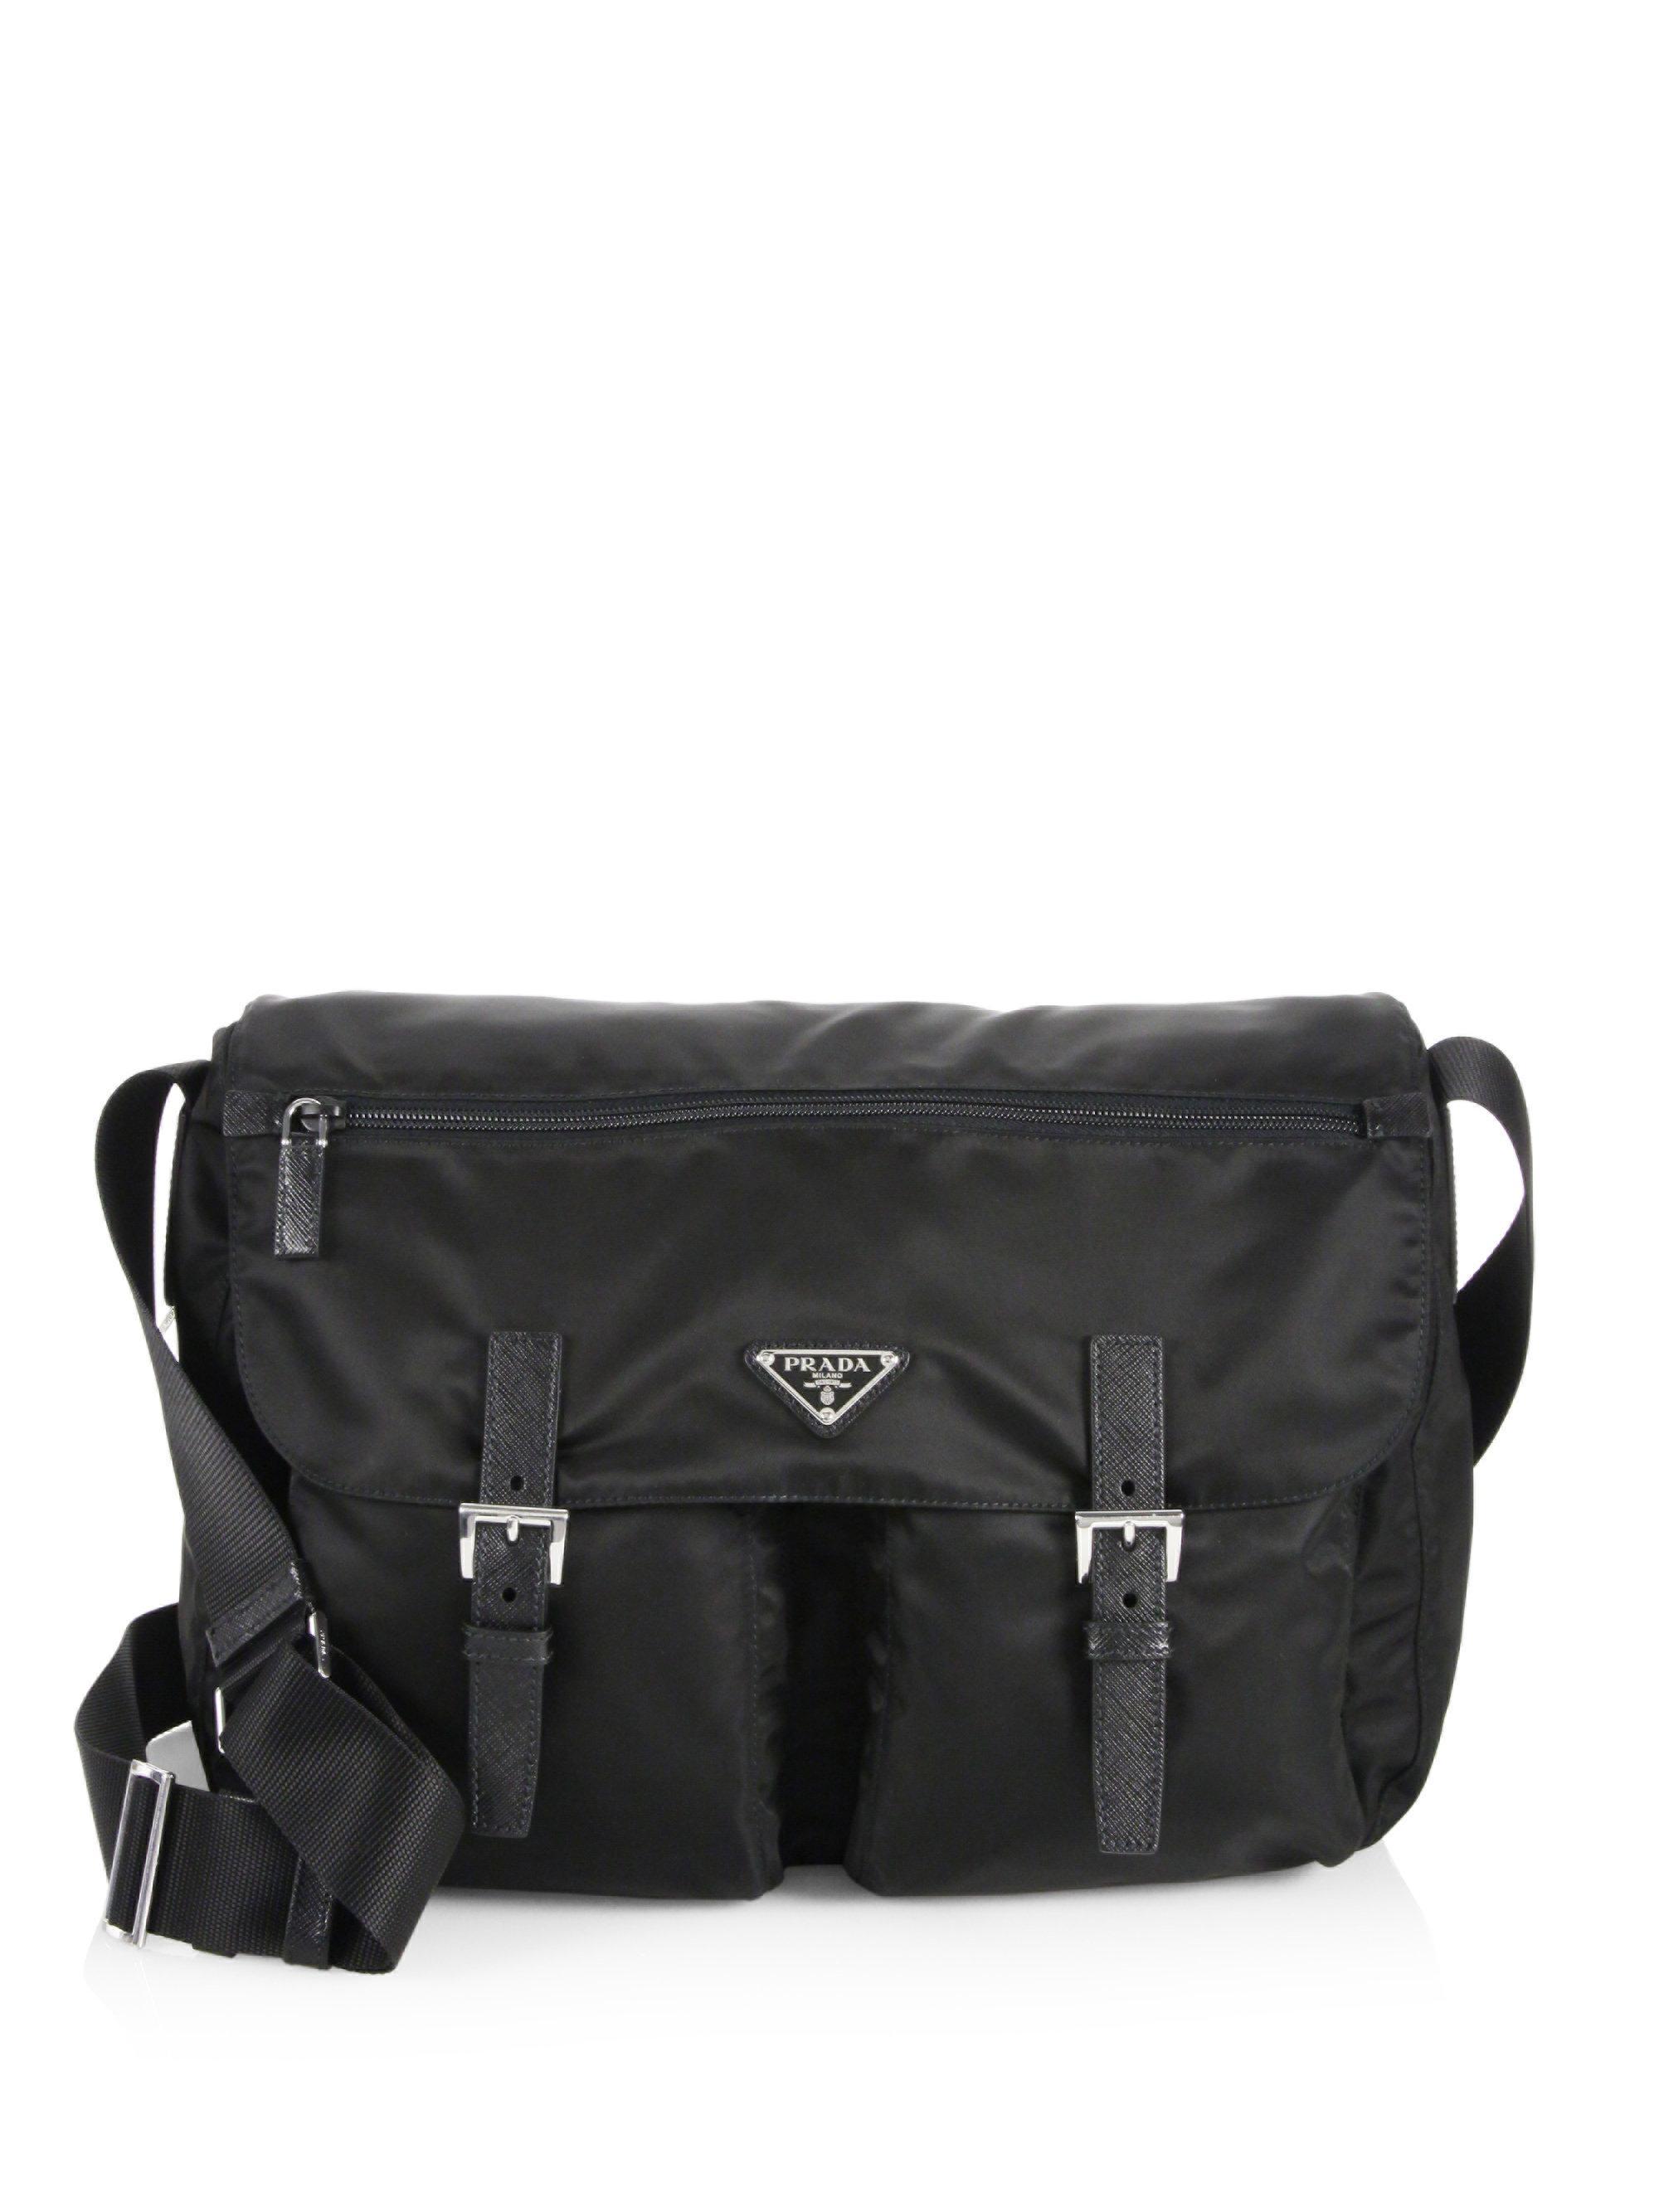 a336f9d78655 ... cheapest lyst prada nylon saffiano leather messenger bag in black 0ddcf  13528